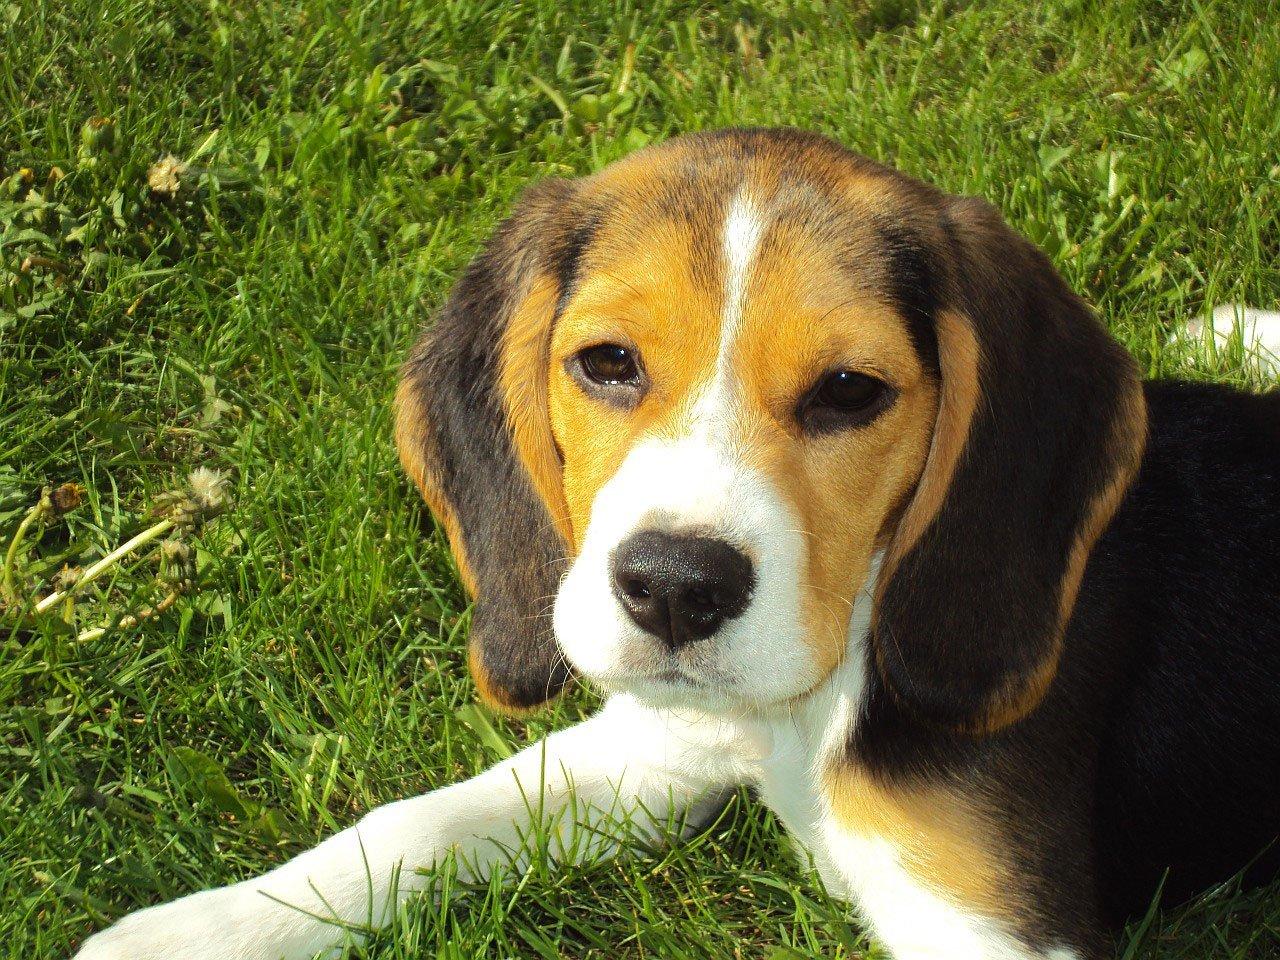 Beagle Puppy, Animal, Beagle, Dog, Friend, HQ Photo